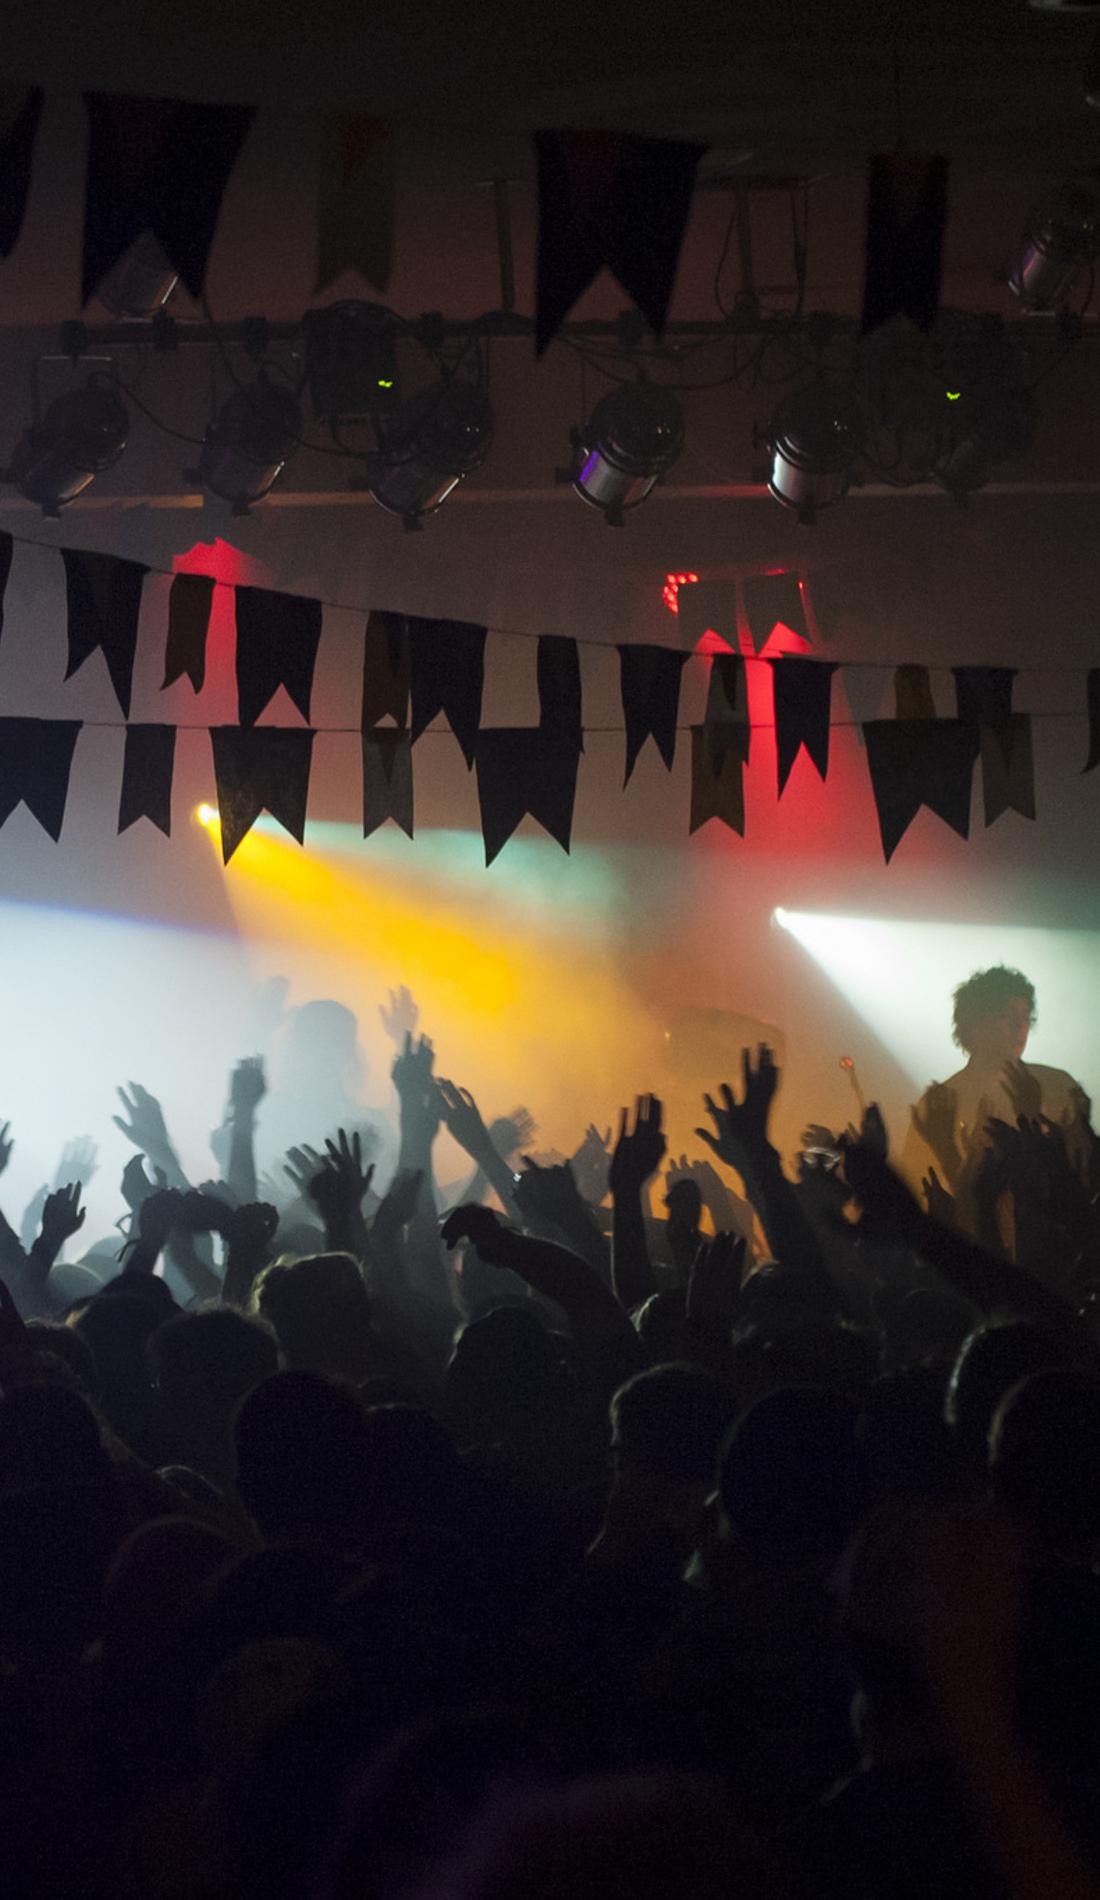 A Laid Back Festival live event